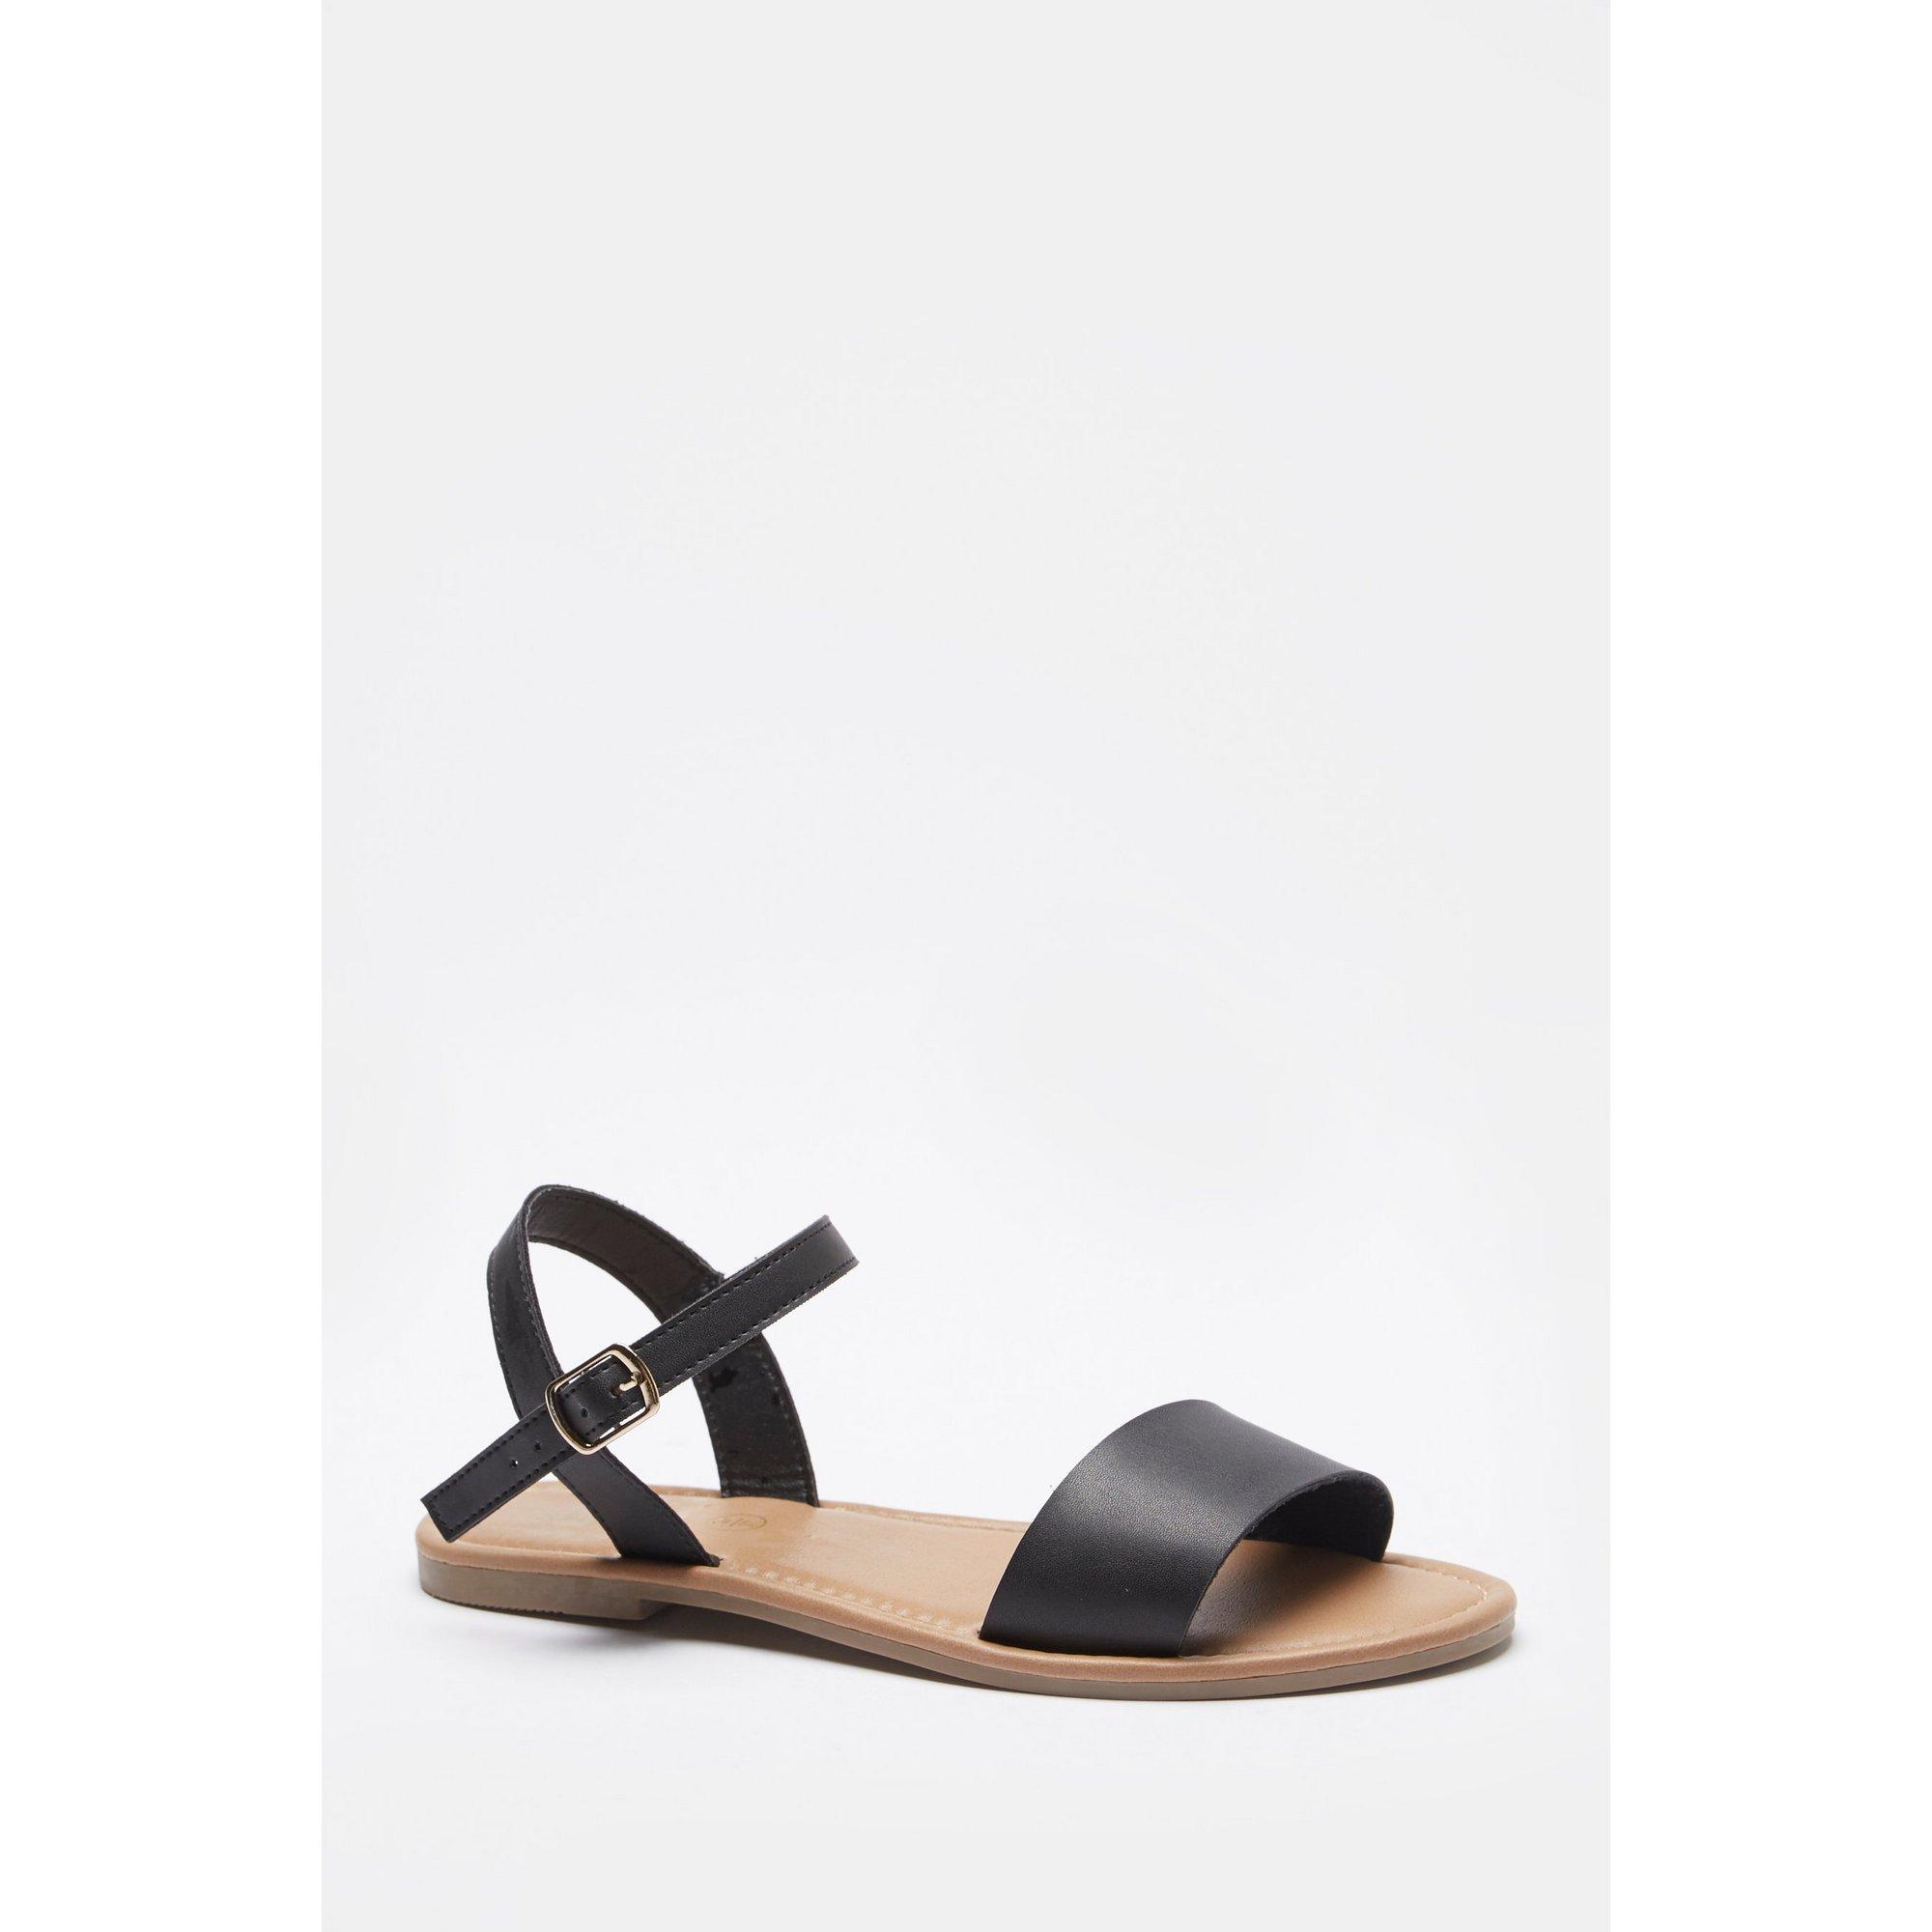 Image of 2-Part Sandals